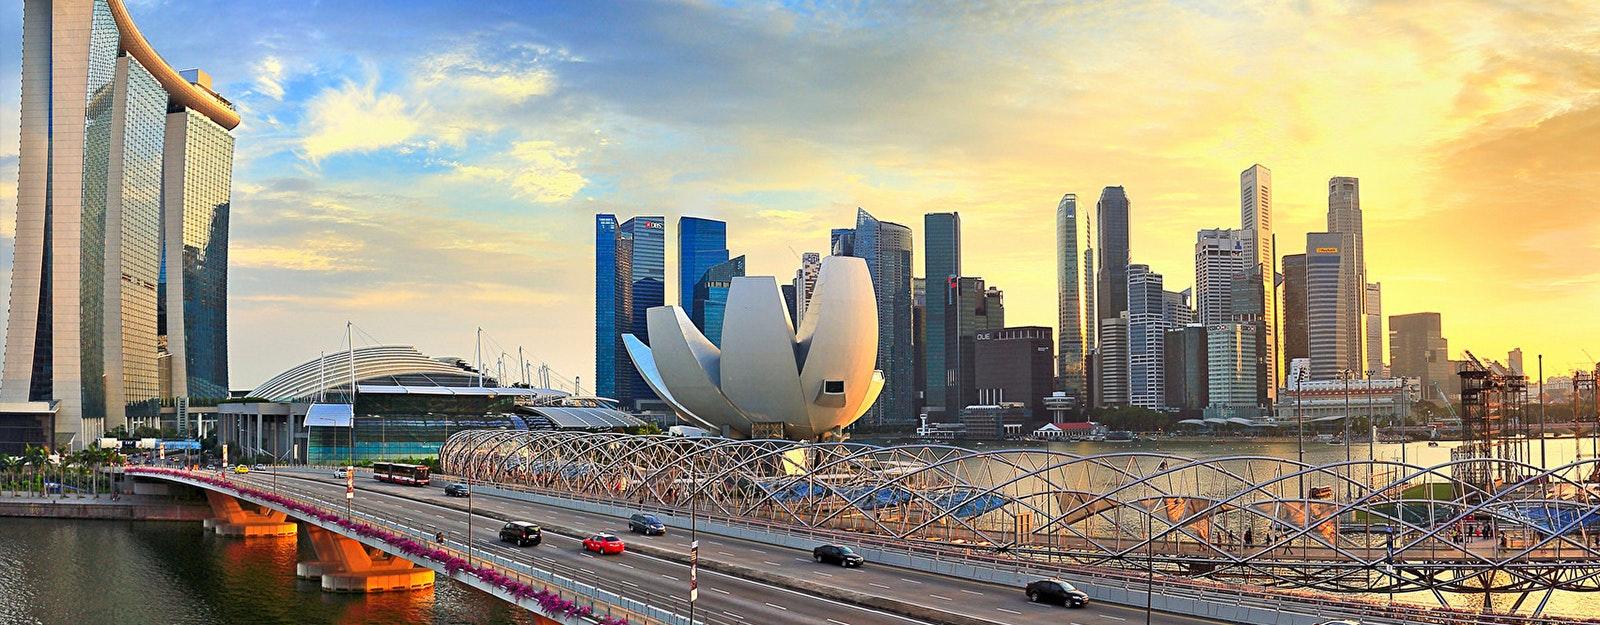 singapore hop on hop off